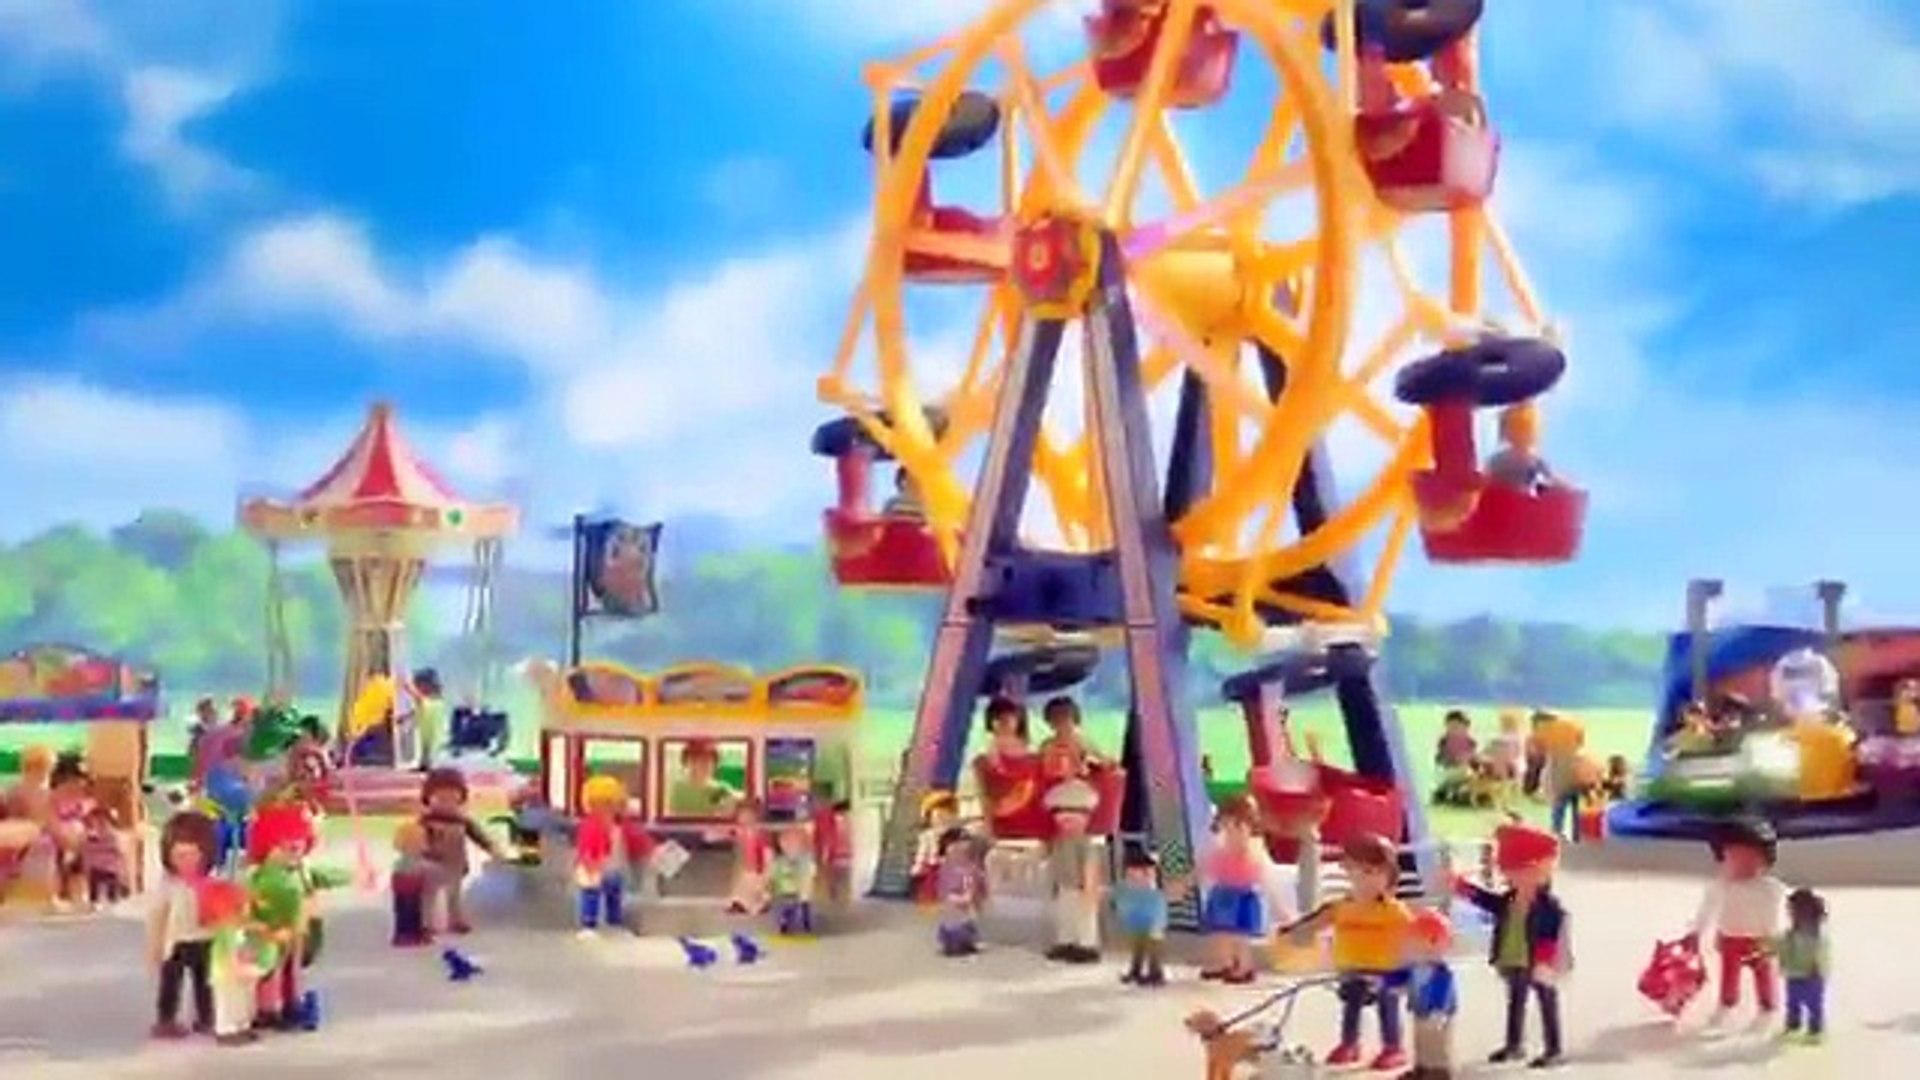 Playmobil Summer Fun - Kermis - Groot draairad 5552, Zweefmolen 5548 & Breakdance 5554